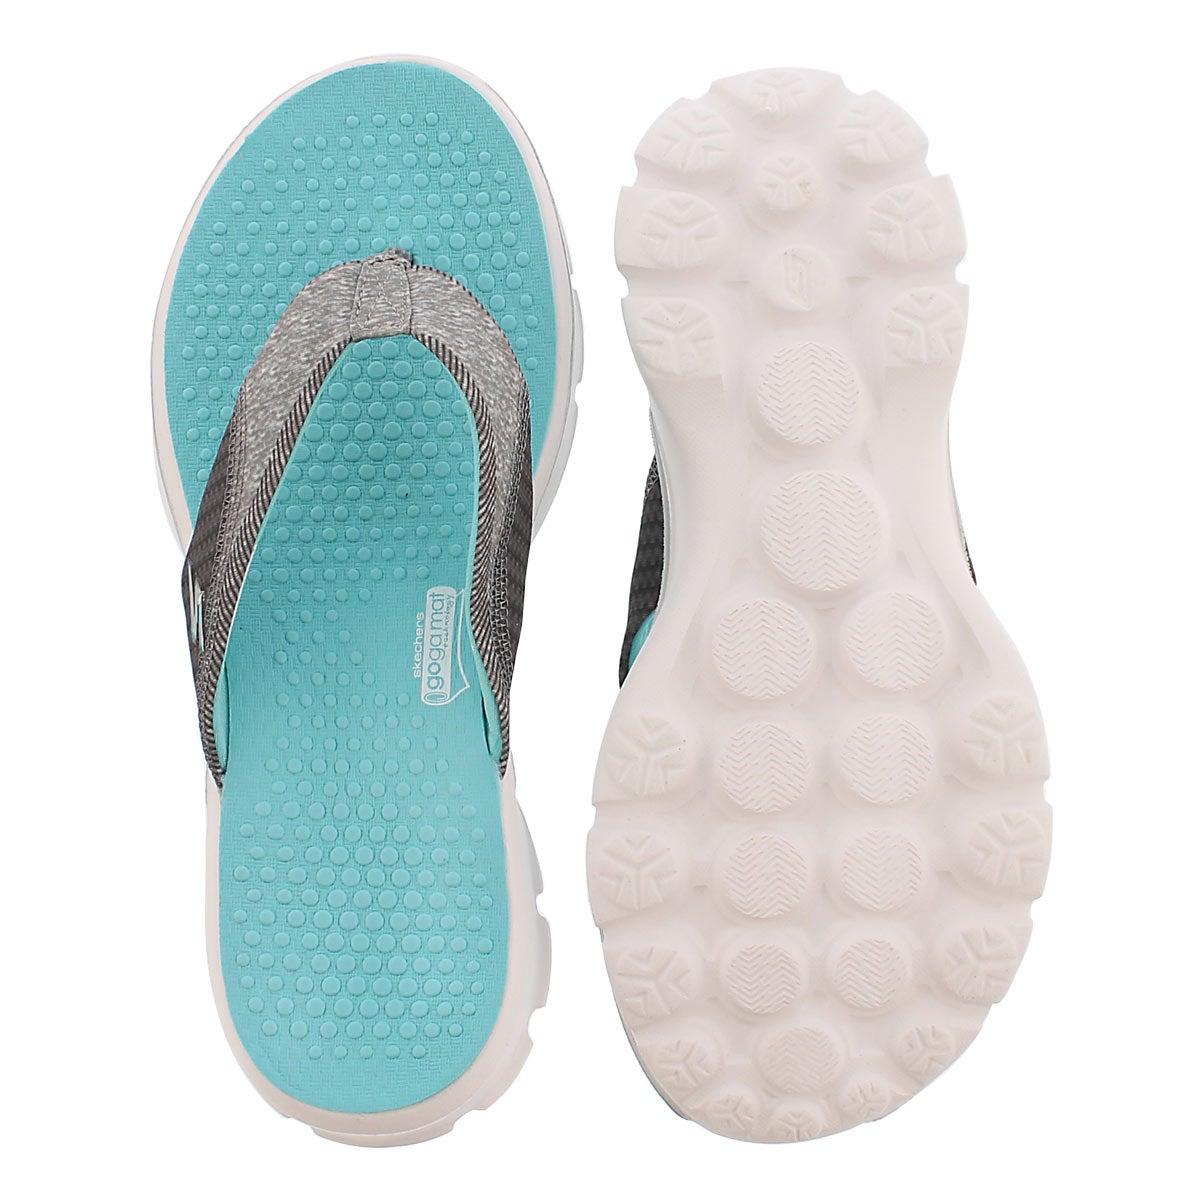 Lds Pizazz aqua thong sandal